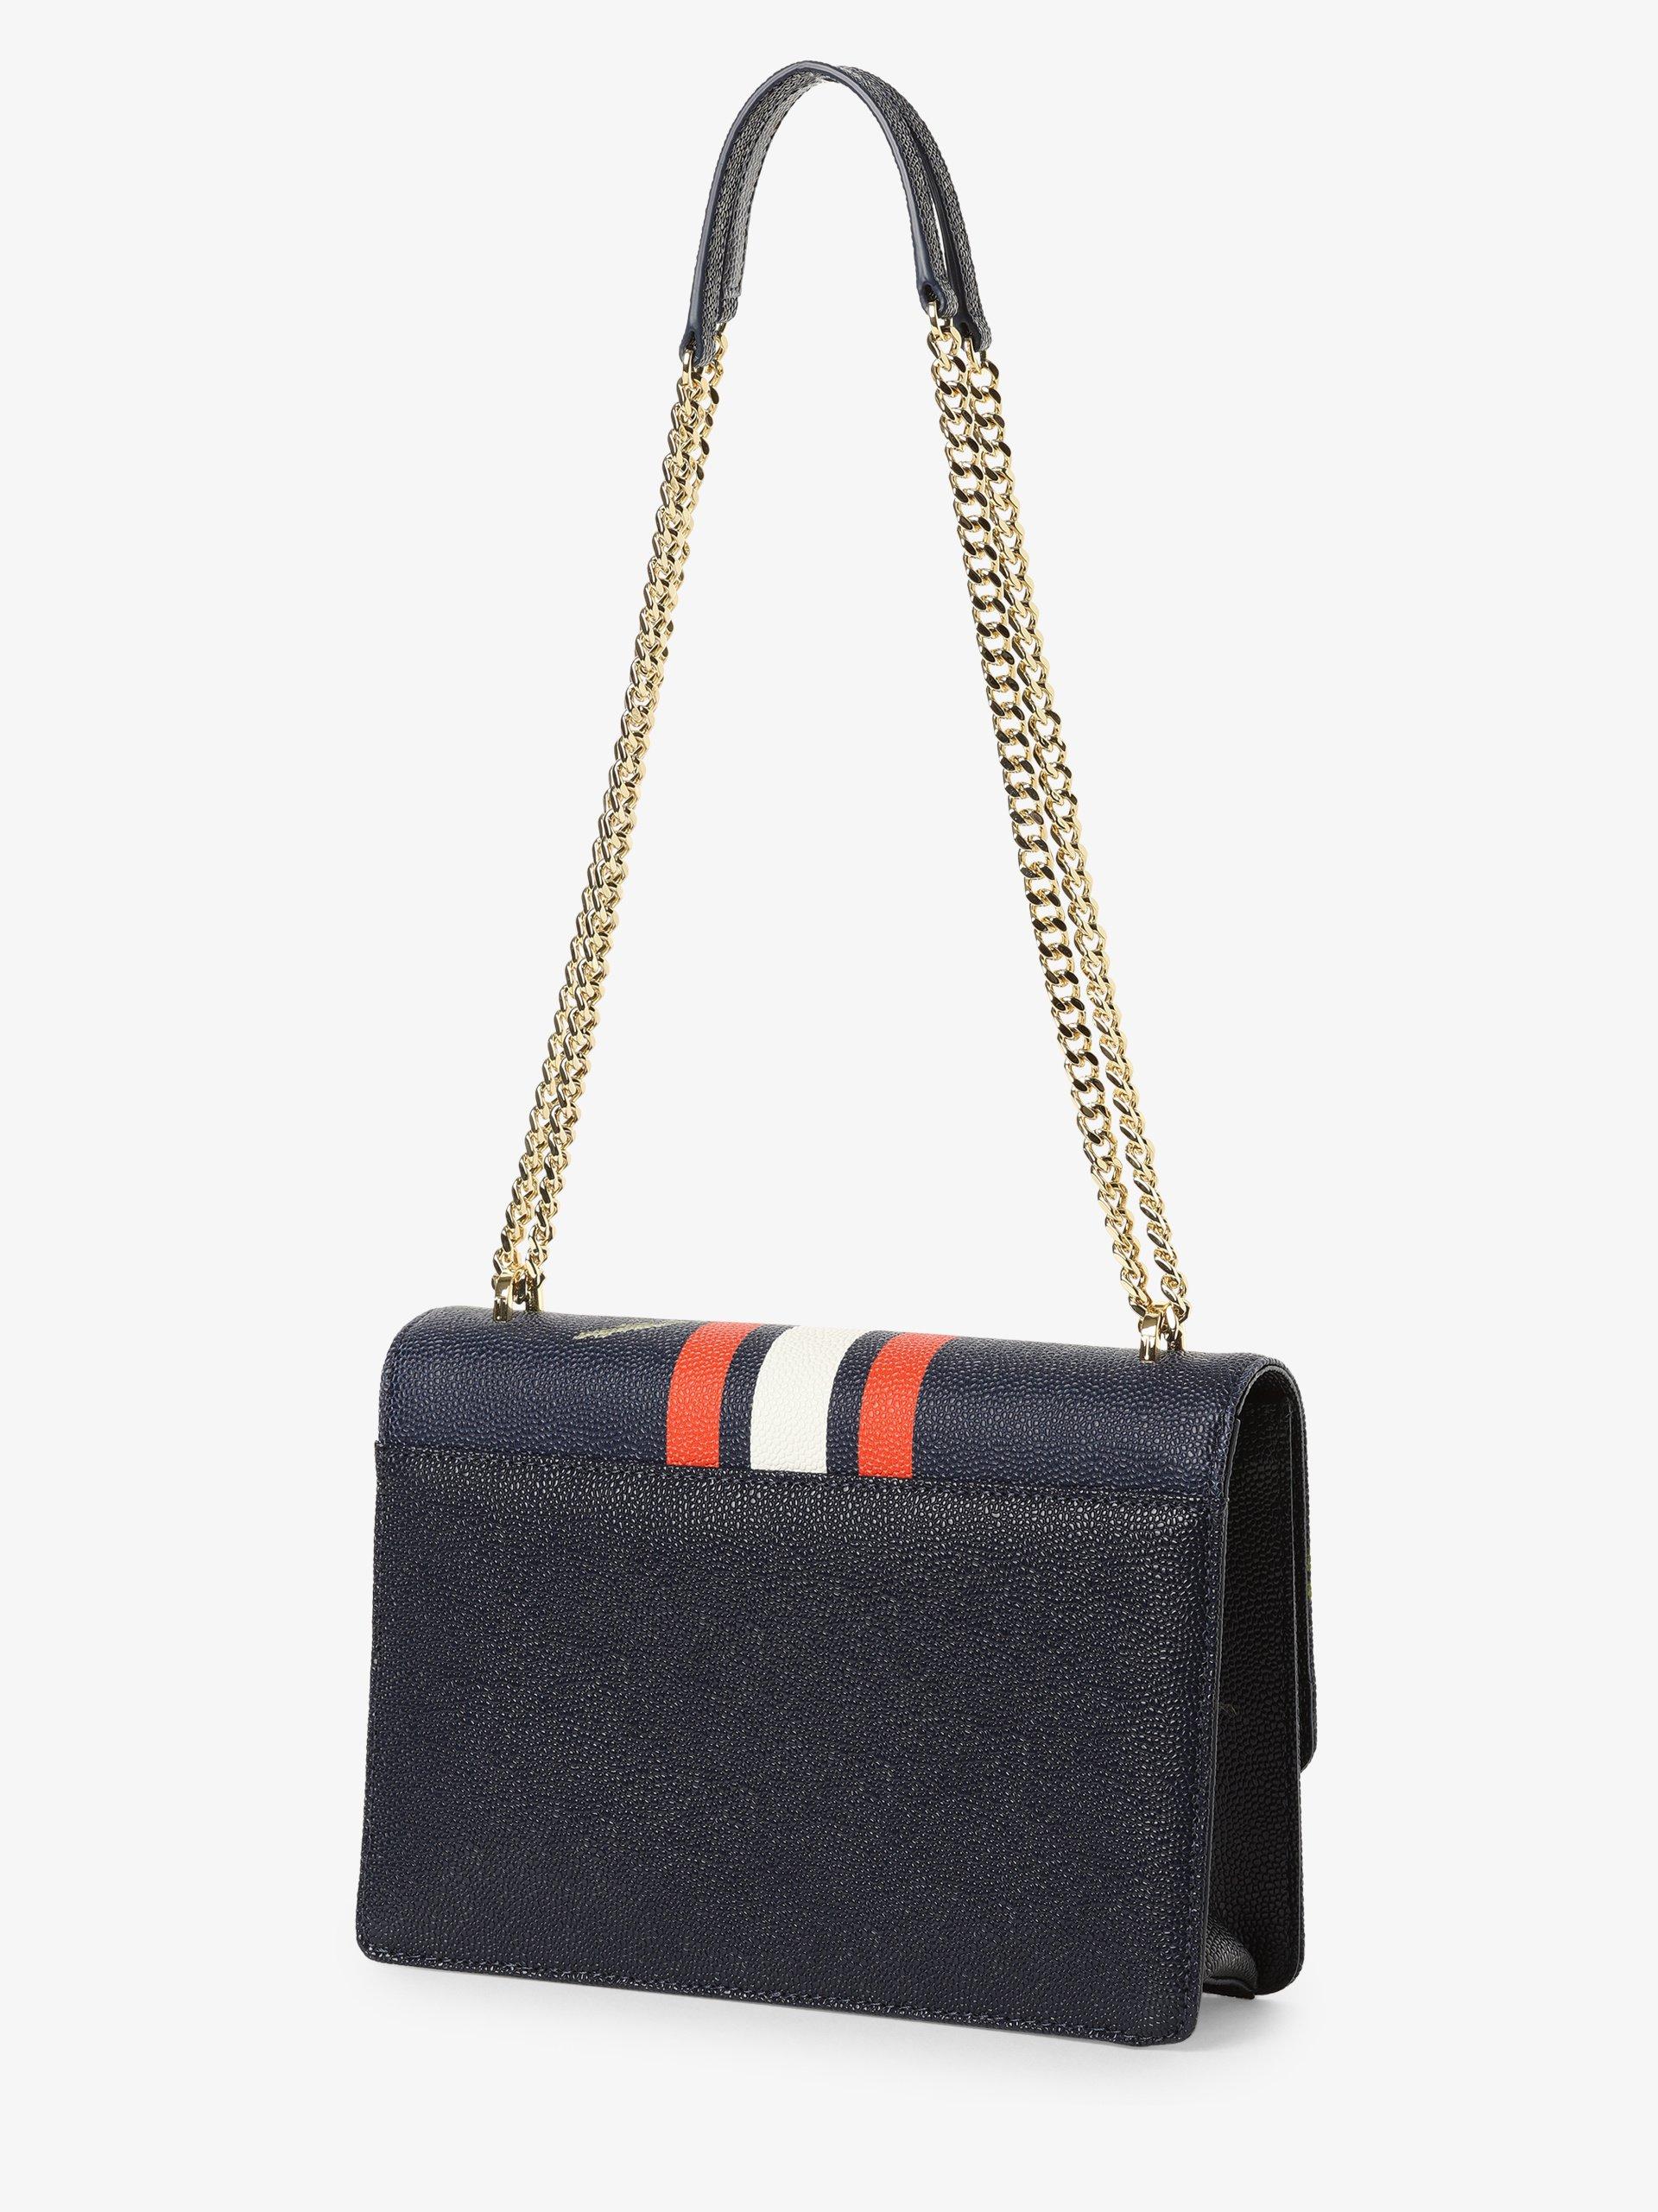 Ted Baker Damen Handtasche aus Leder - Tracyy